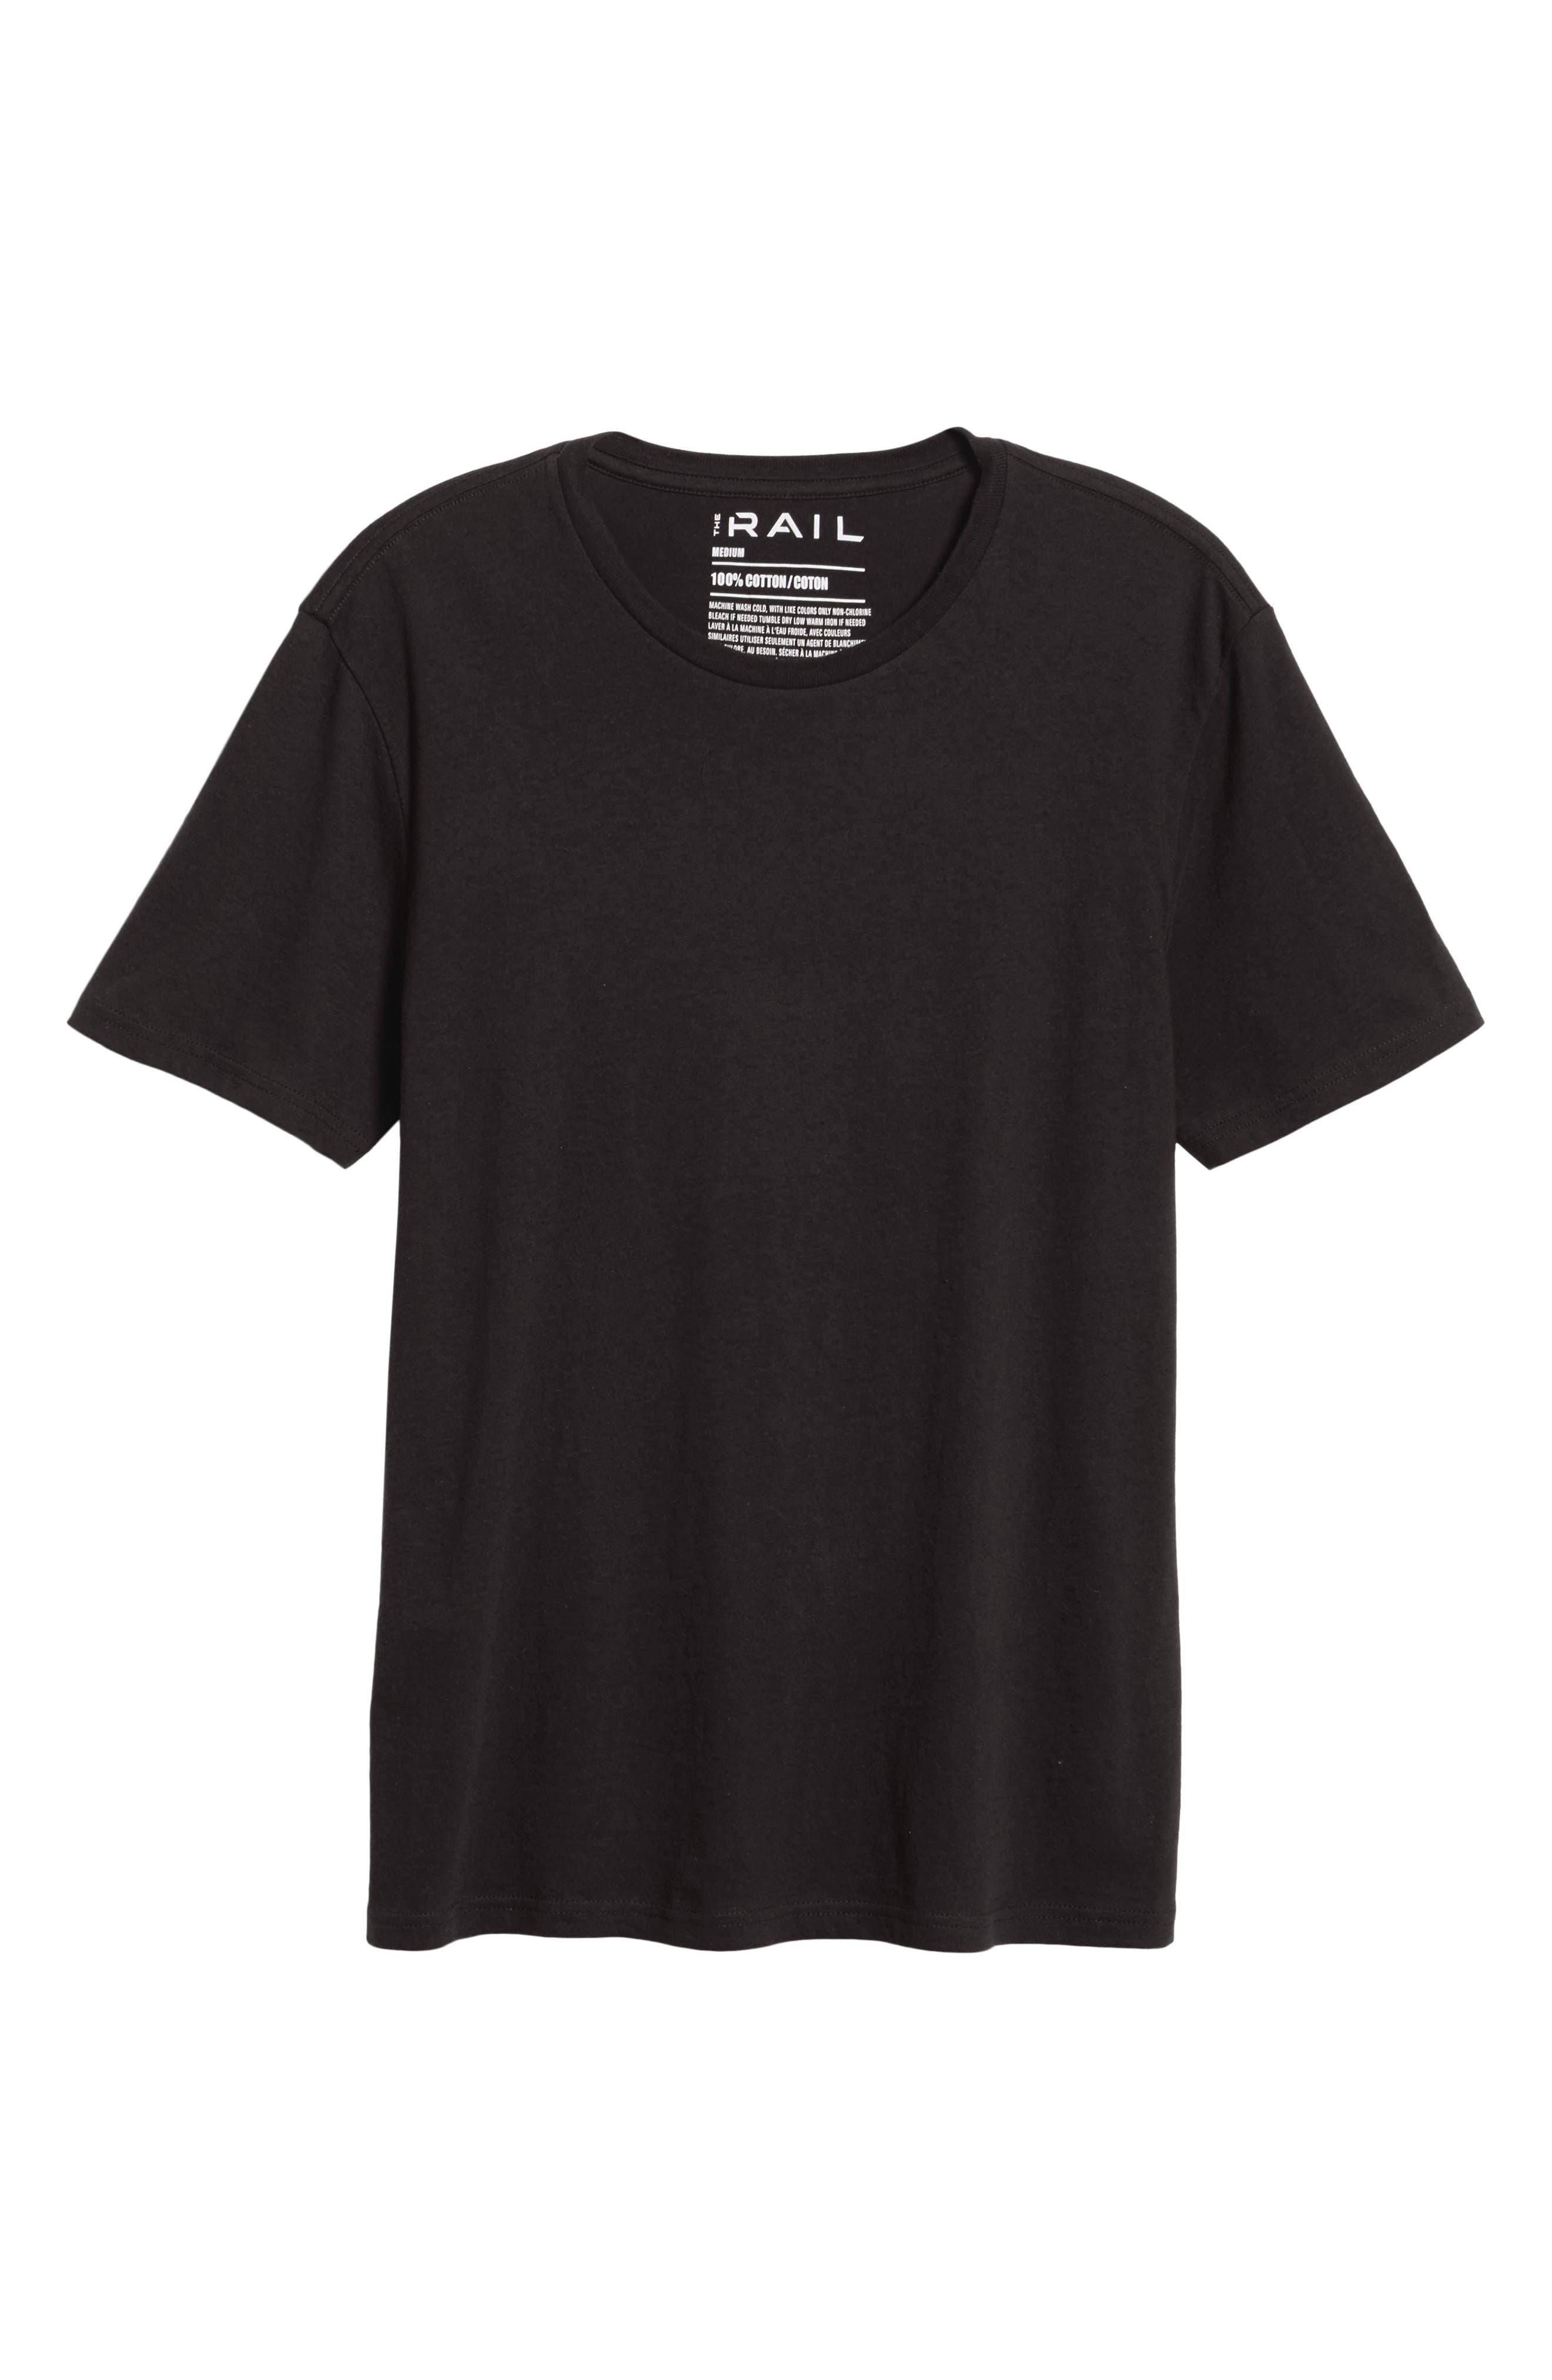 THE RAIL, Slim Fit Crewneck T-Shirt, Main thumbnail 1, color, BLACK